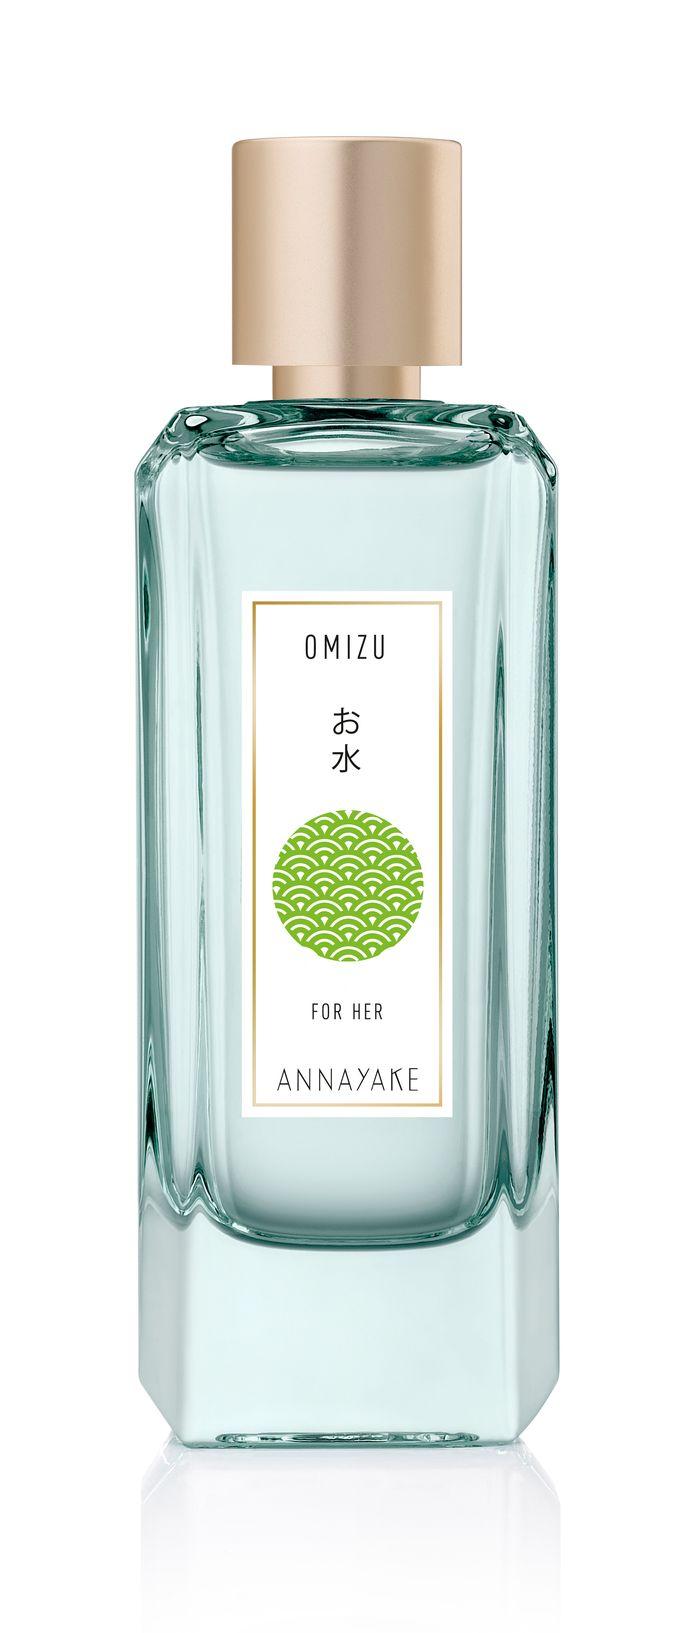 Omizu for Her d'Annayake.